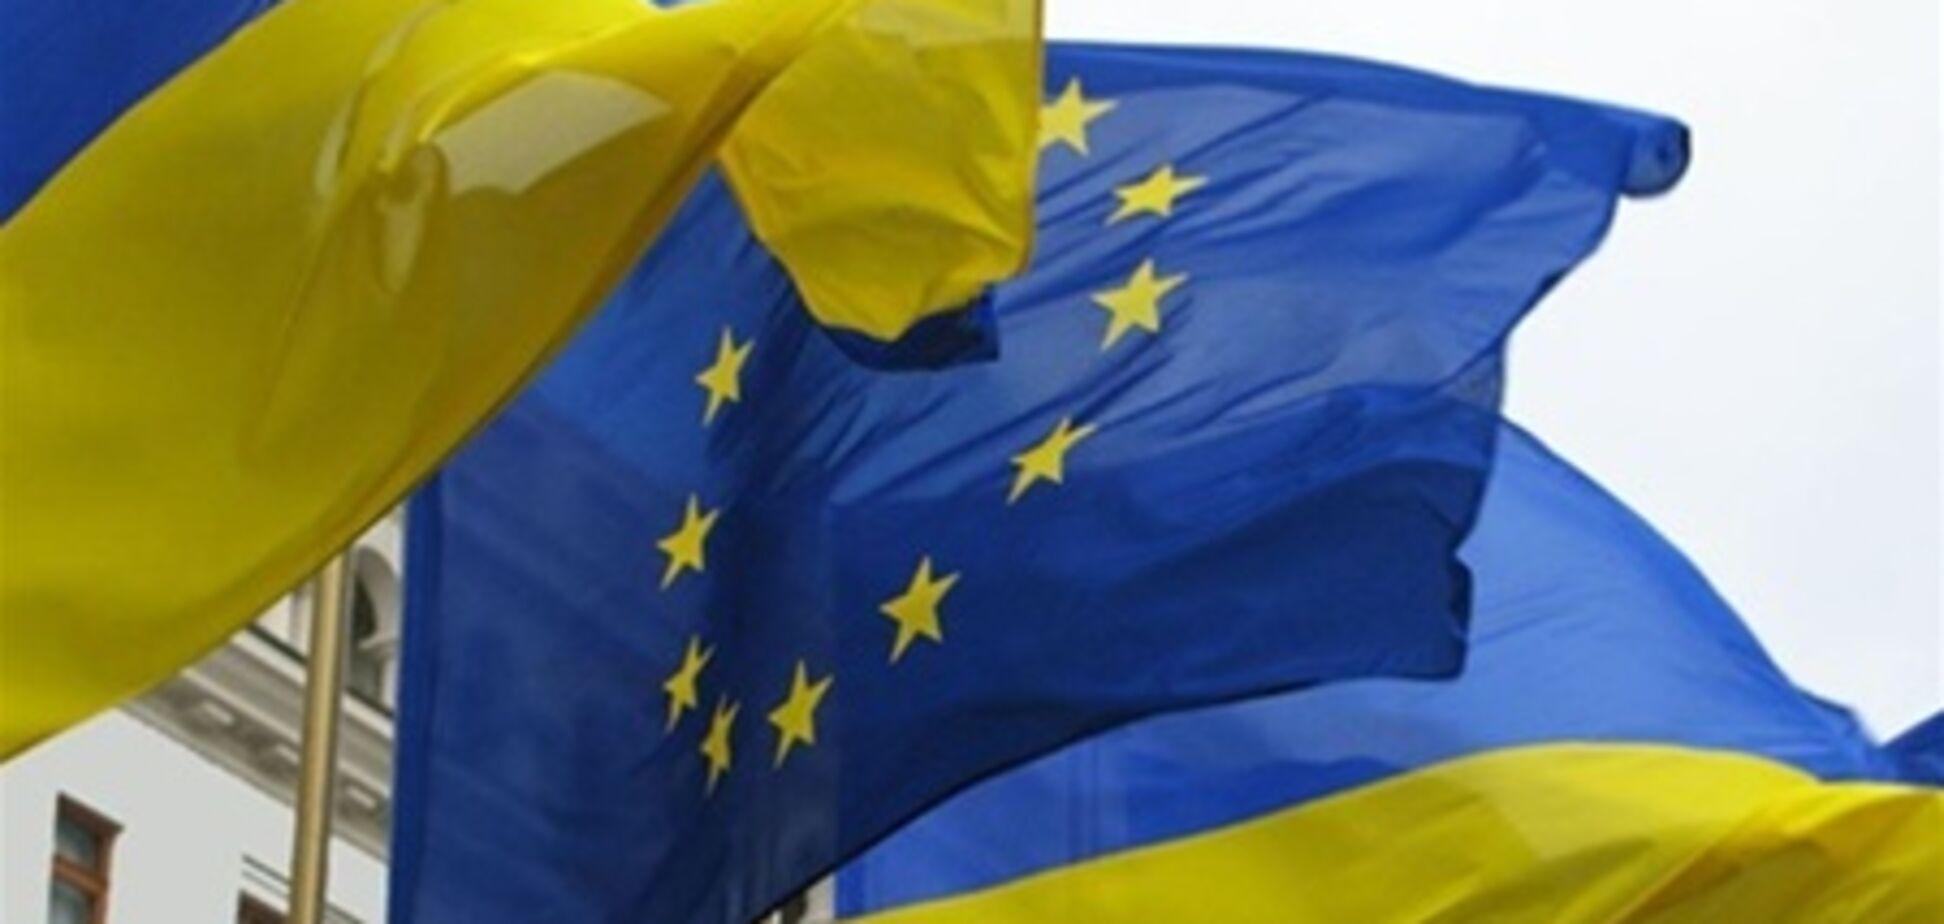 Сегодня Украина и ЕС парафируют Соглашение об ассоциации